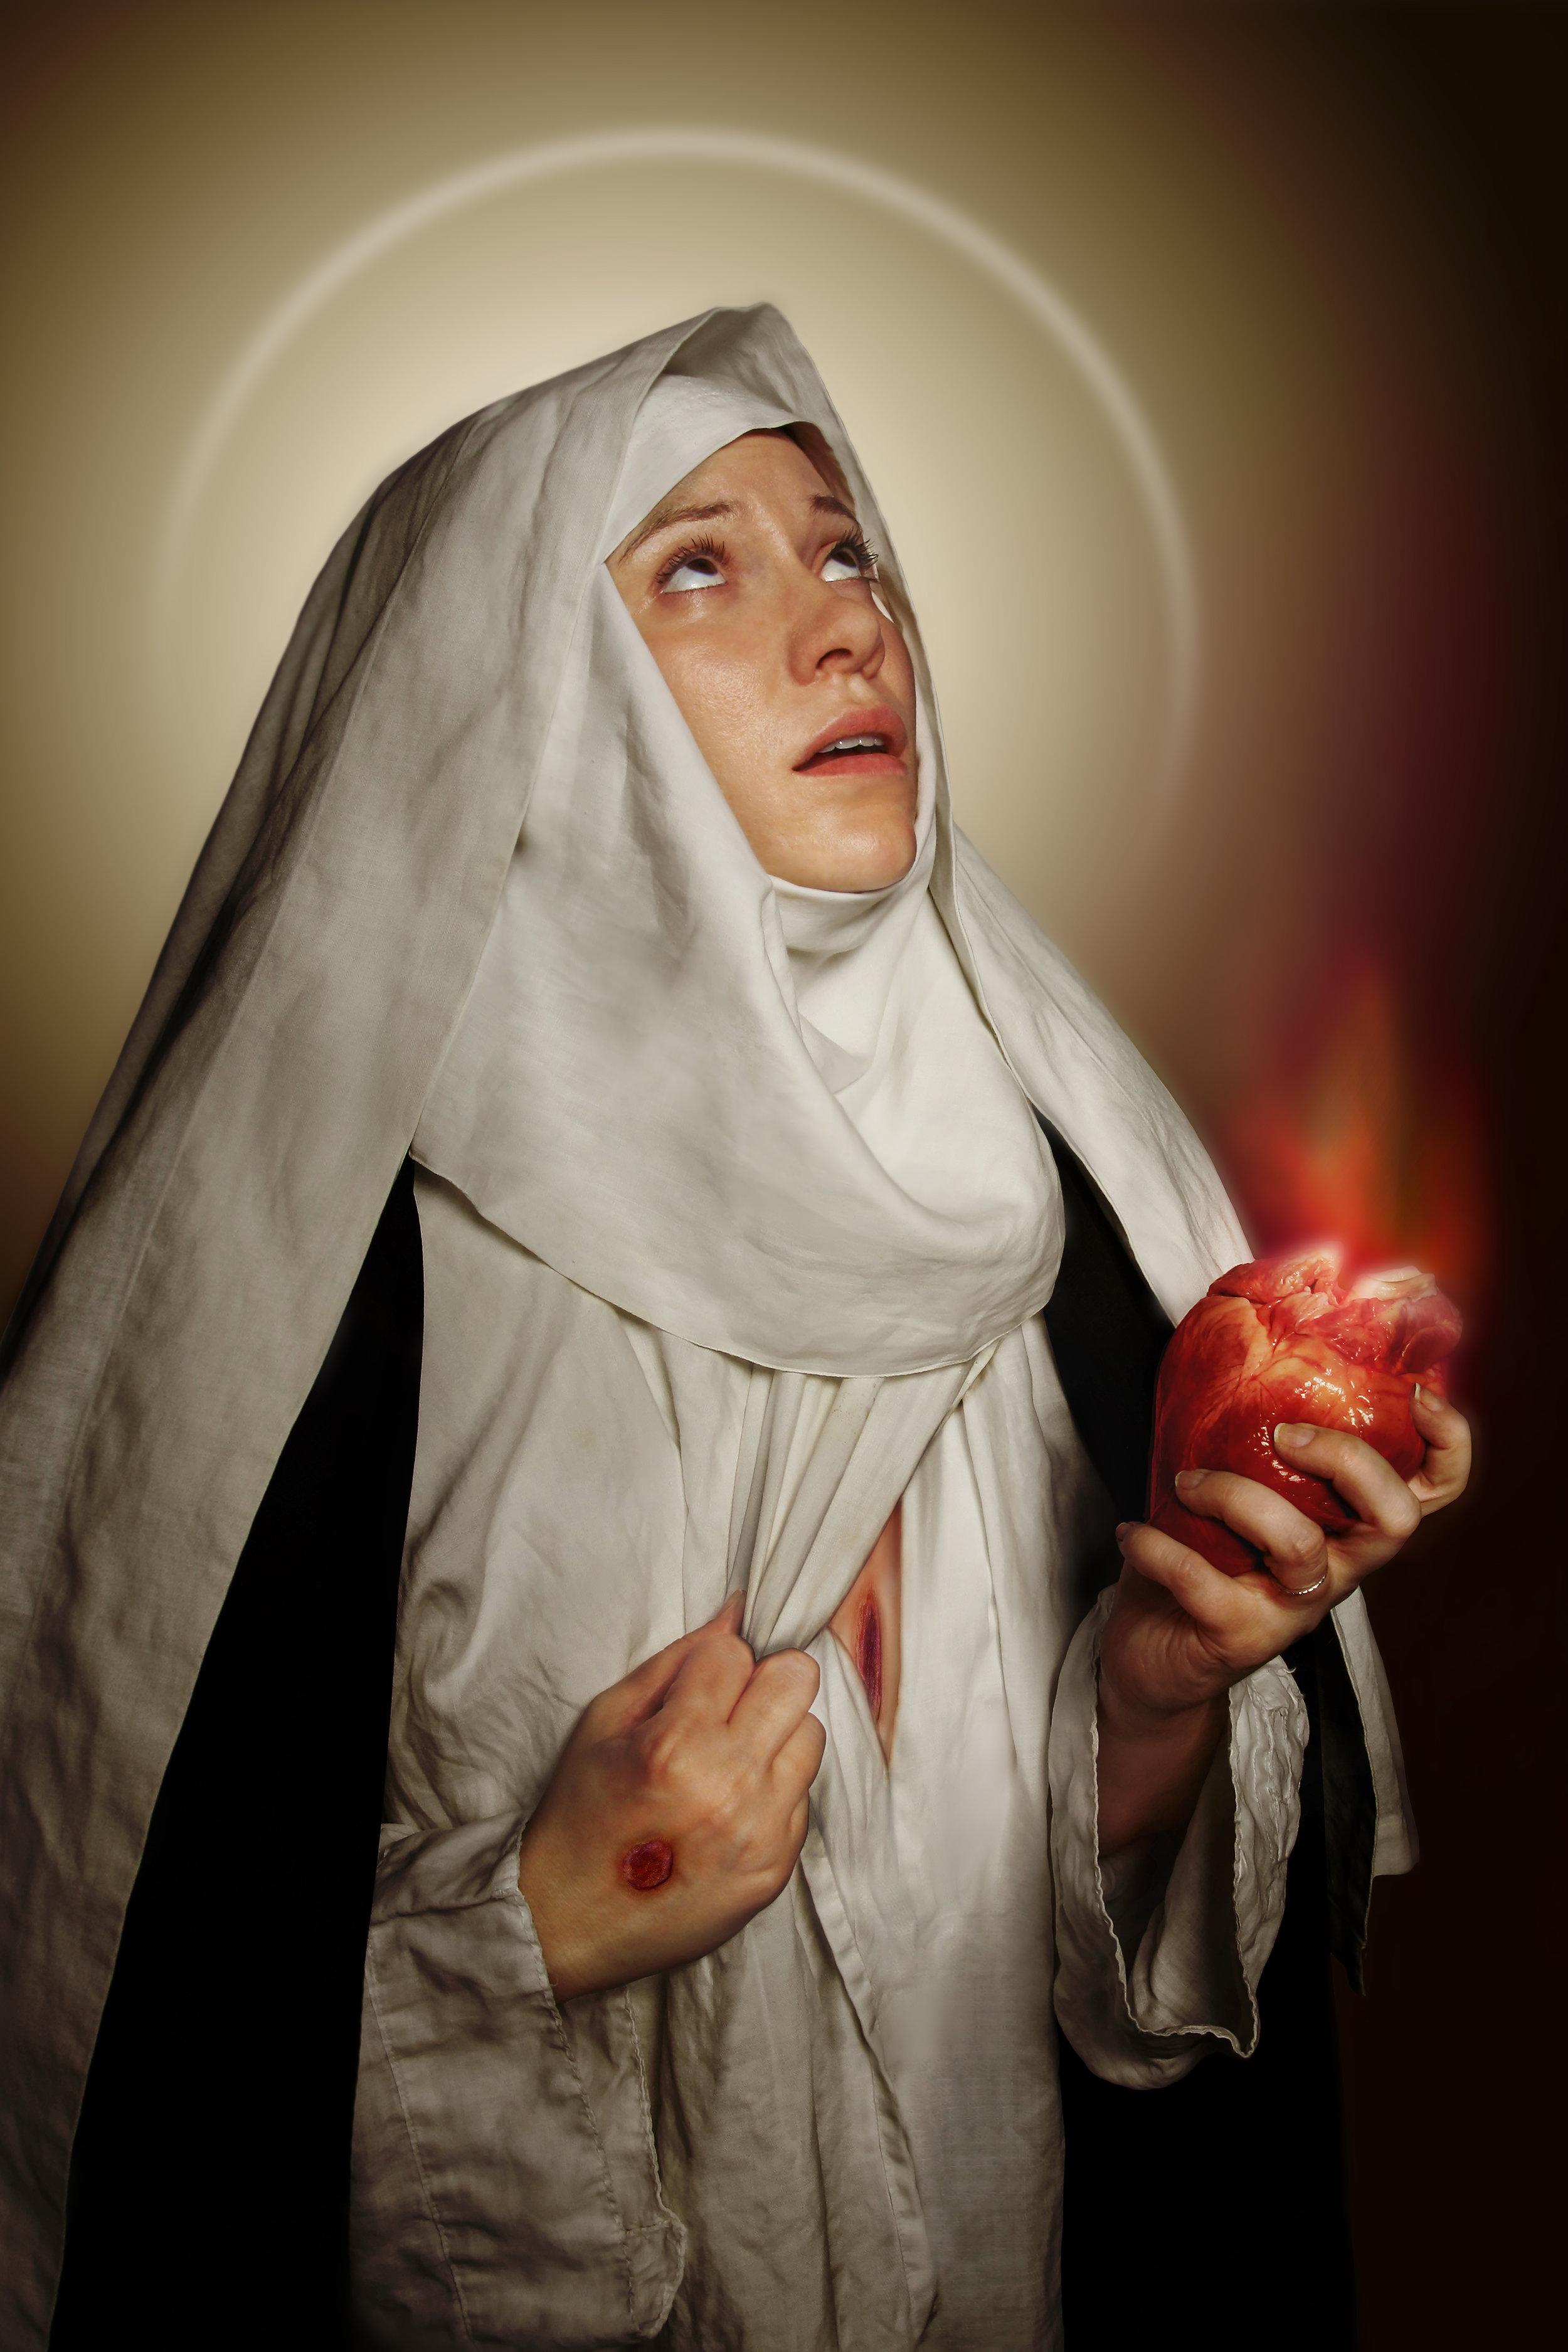 Catherine of Siena , Jordan Hainsey, Digital Photograph, 2018